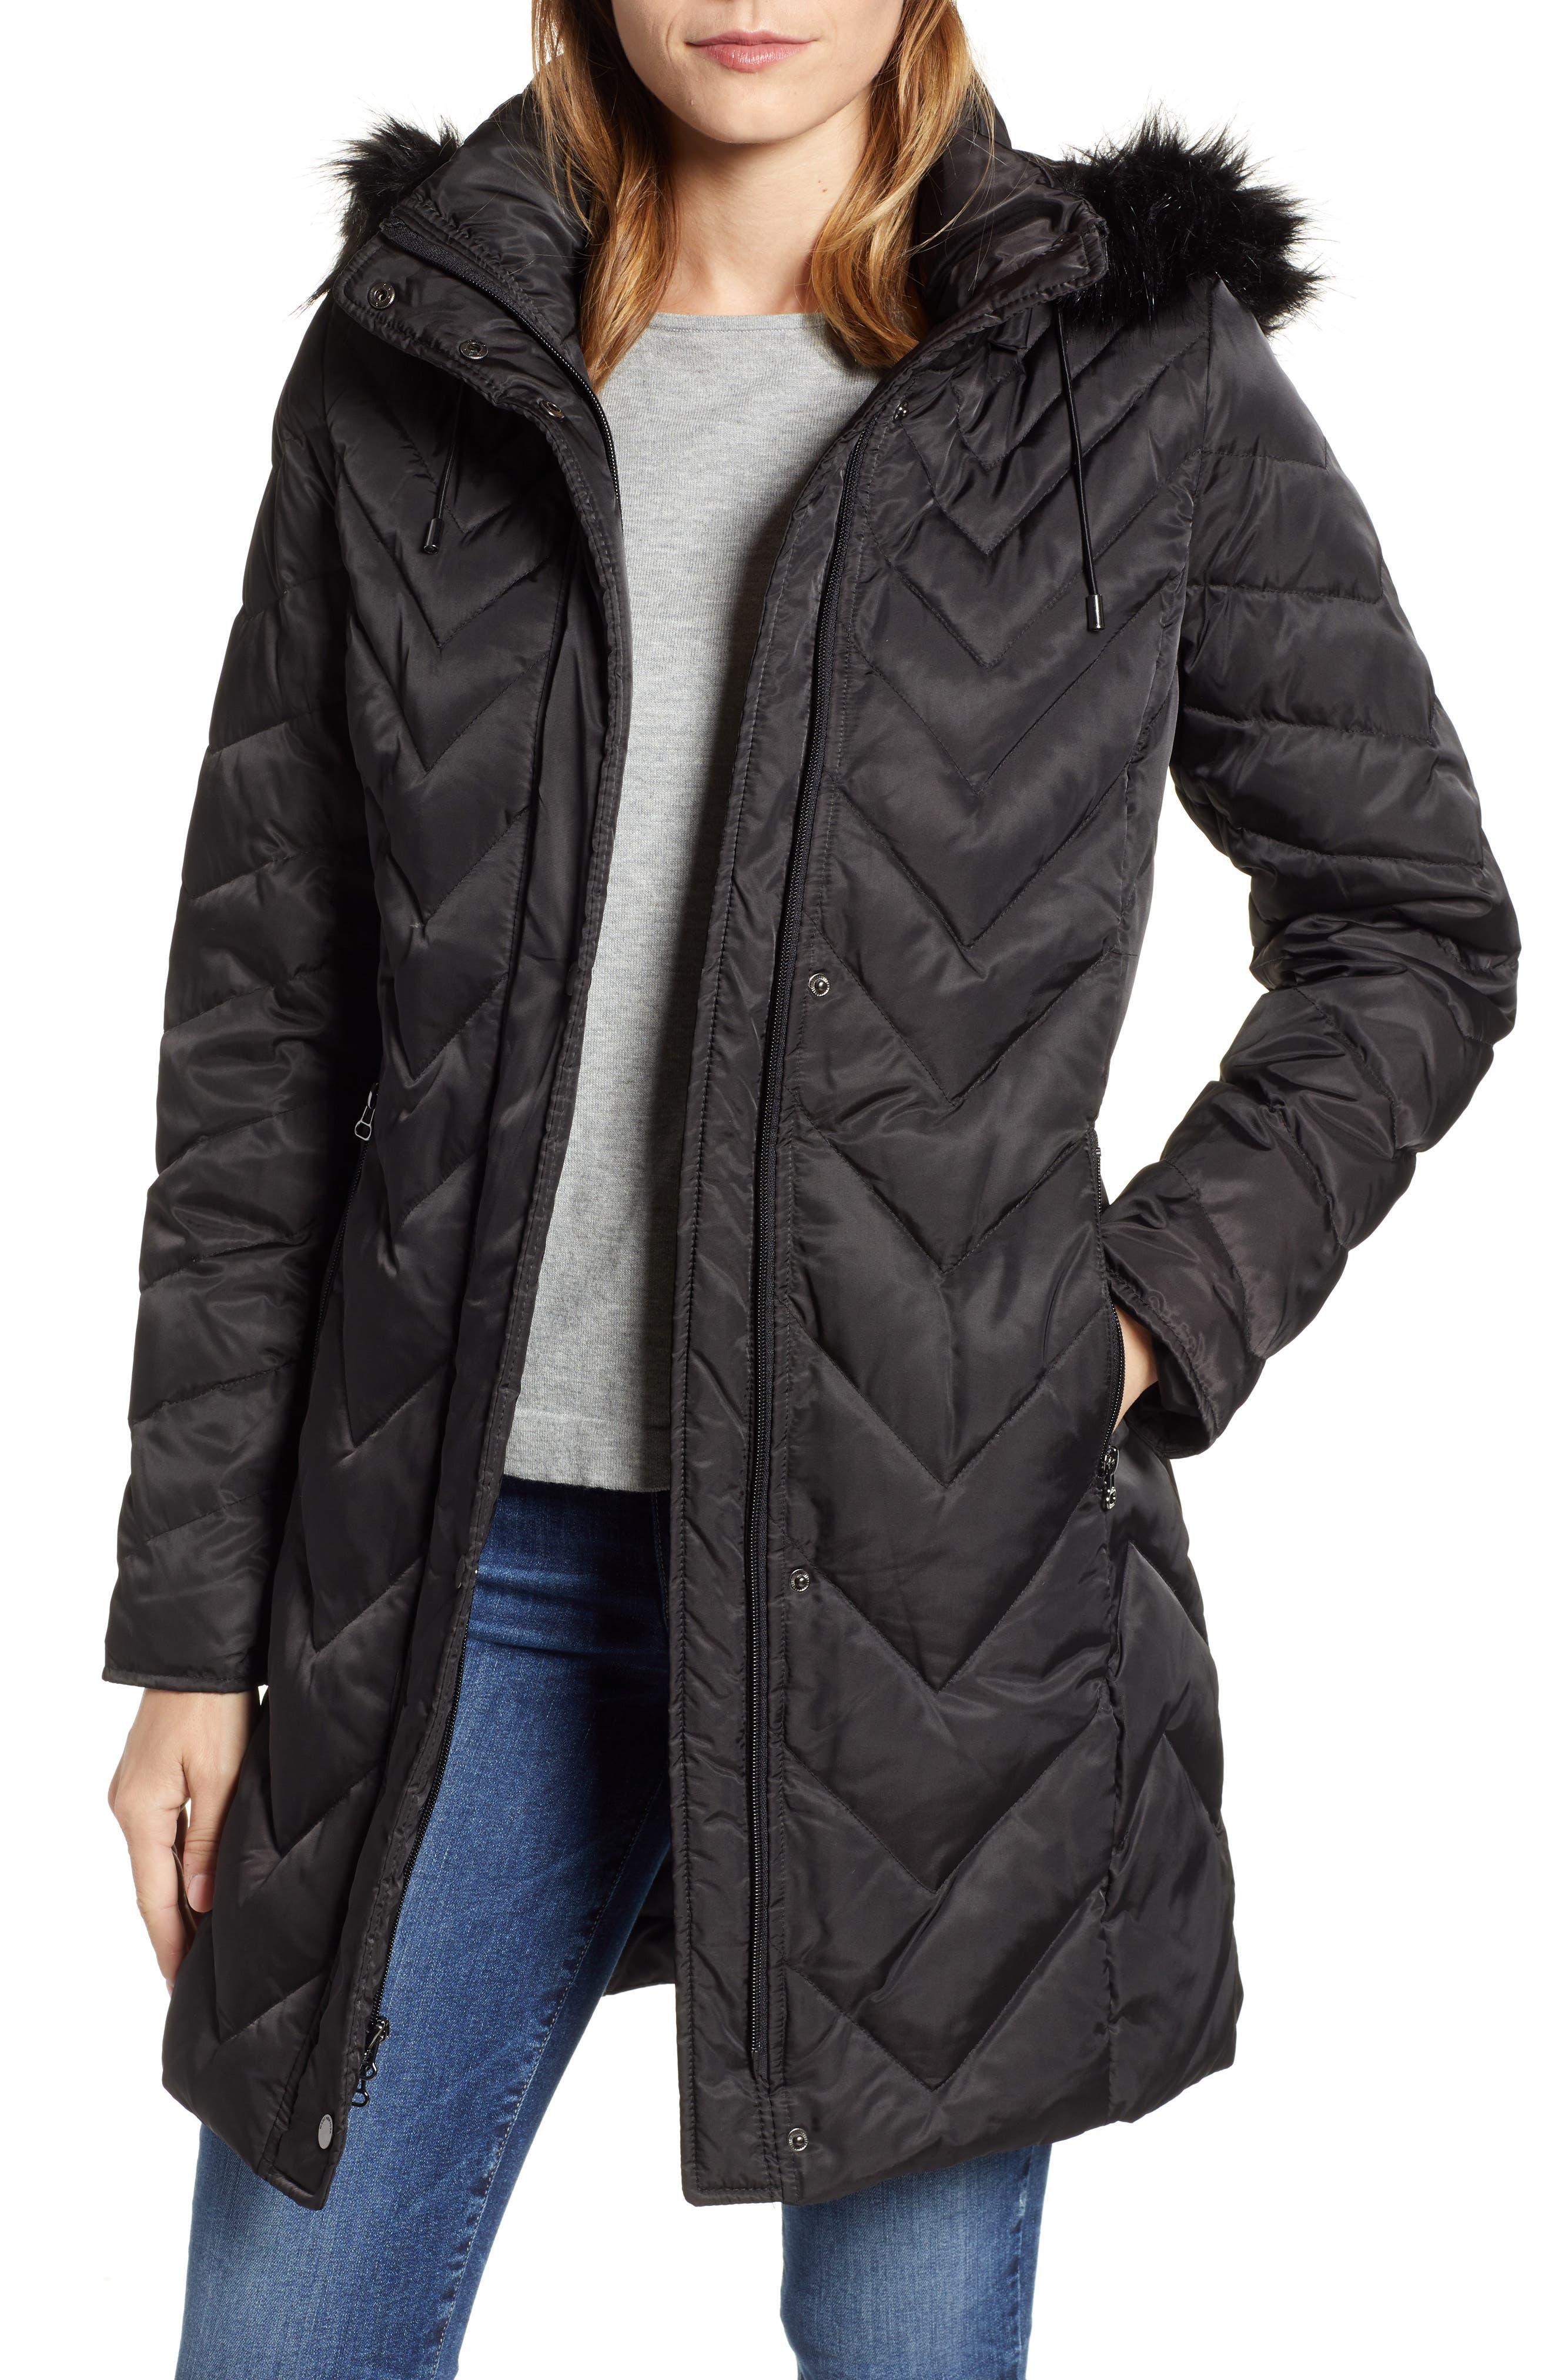 MARC NEW YORK, Matte Satin Chevron Faux Fur Trim Coat, Main thumbnail 1, color, BLACK